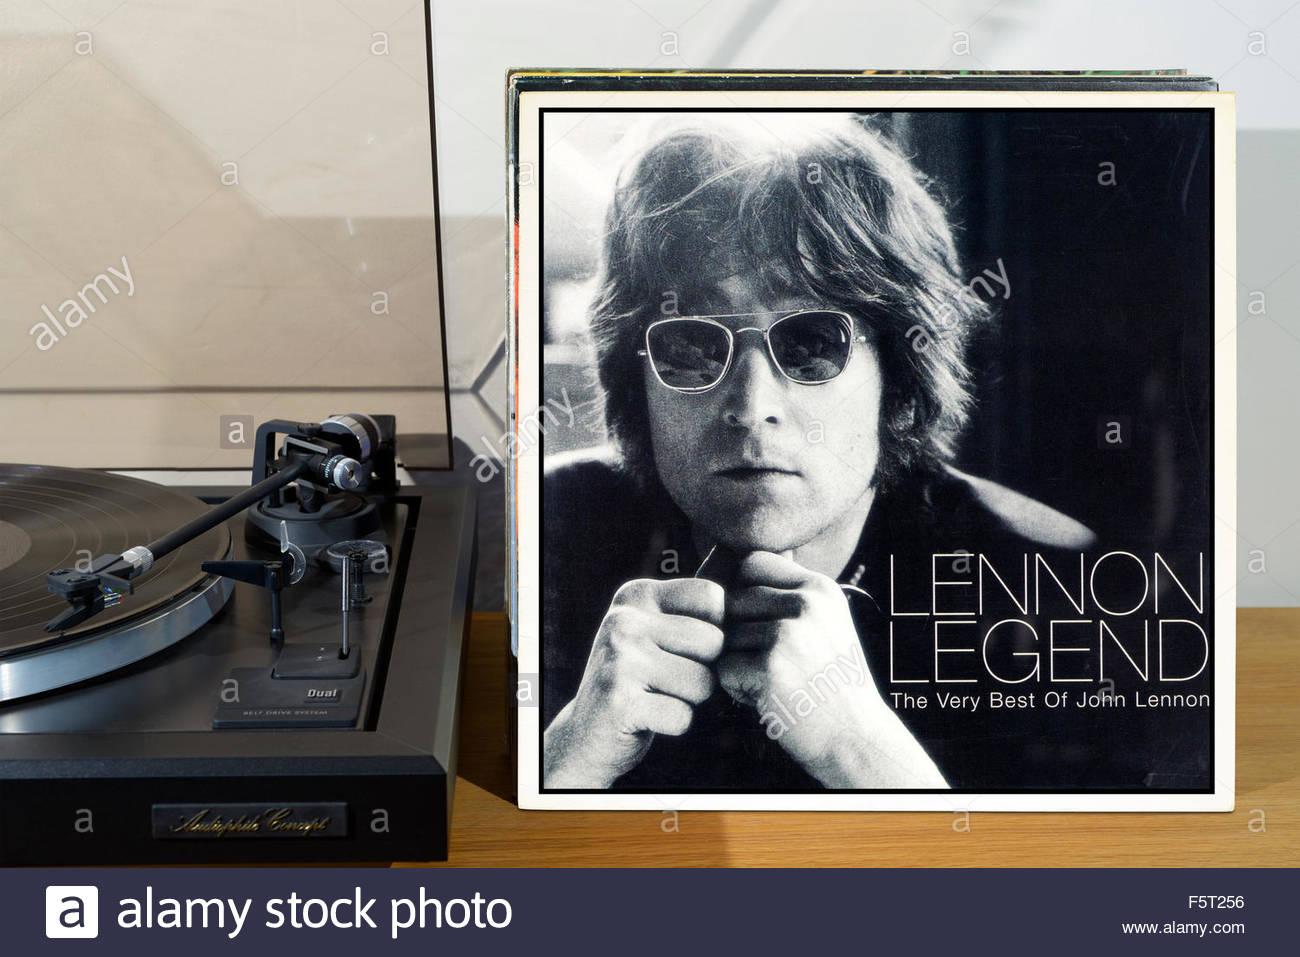 Beatles Record Player Stock Photos Amp Beatles Record Player